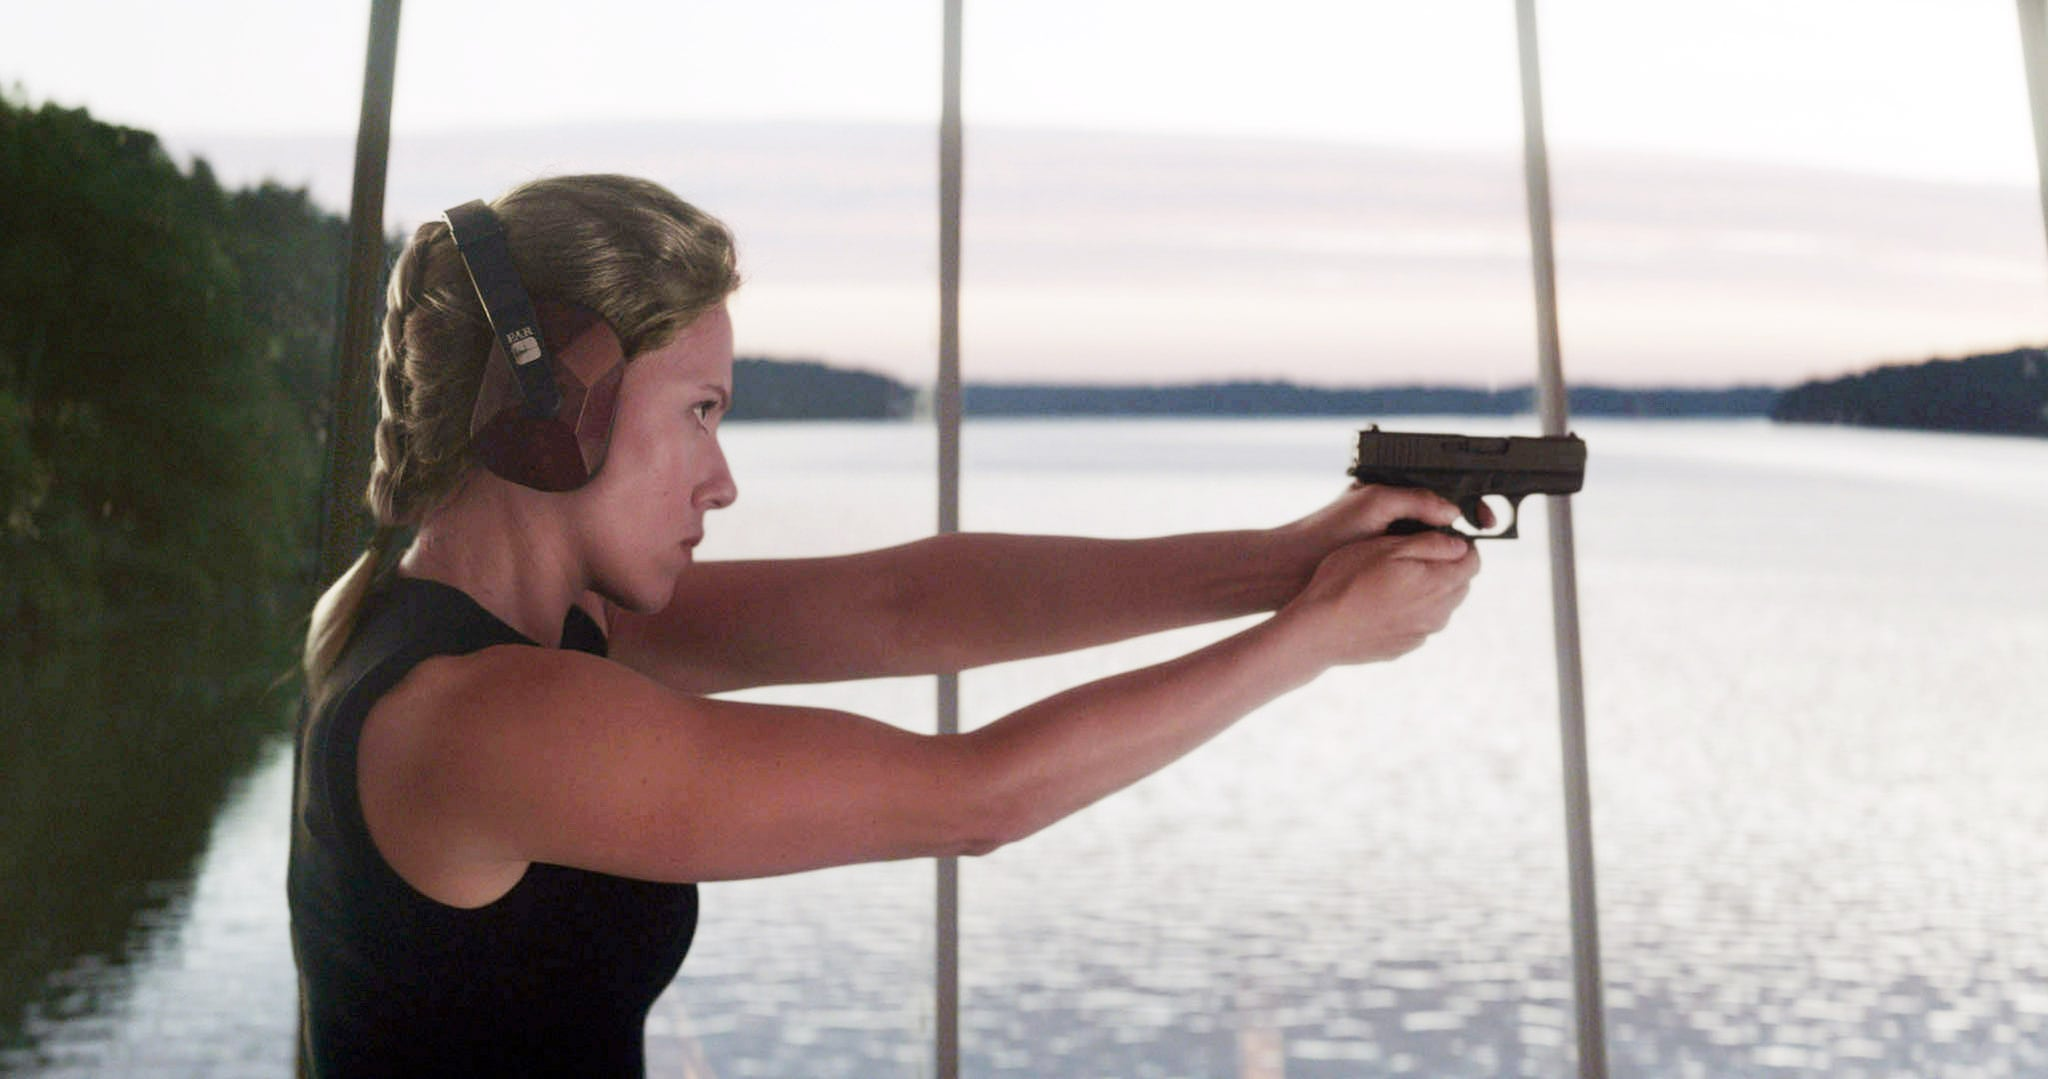 AVENGERS: ENDGAME, (aka AVENGERS 4), Scarlett Johansson as Natasha Romanoff / Black Widow, 2019.  Walt Disney Studios Motion Pictures /  Marvel Studios / courtesy Everett Collection